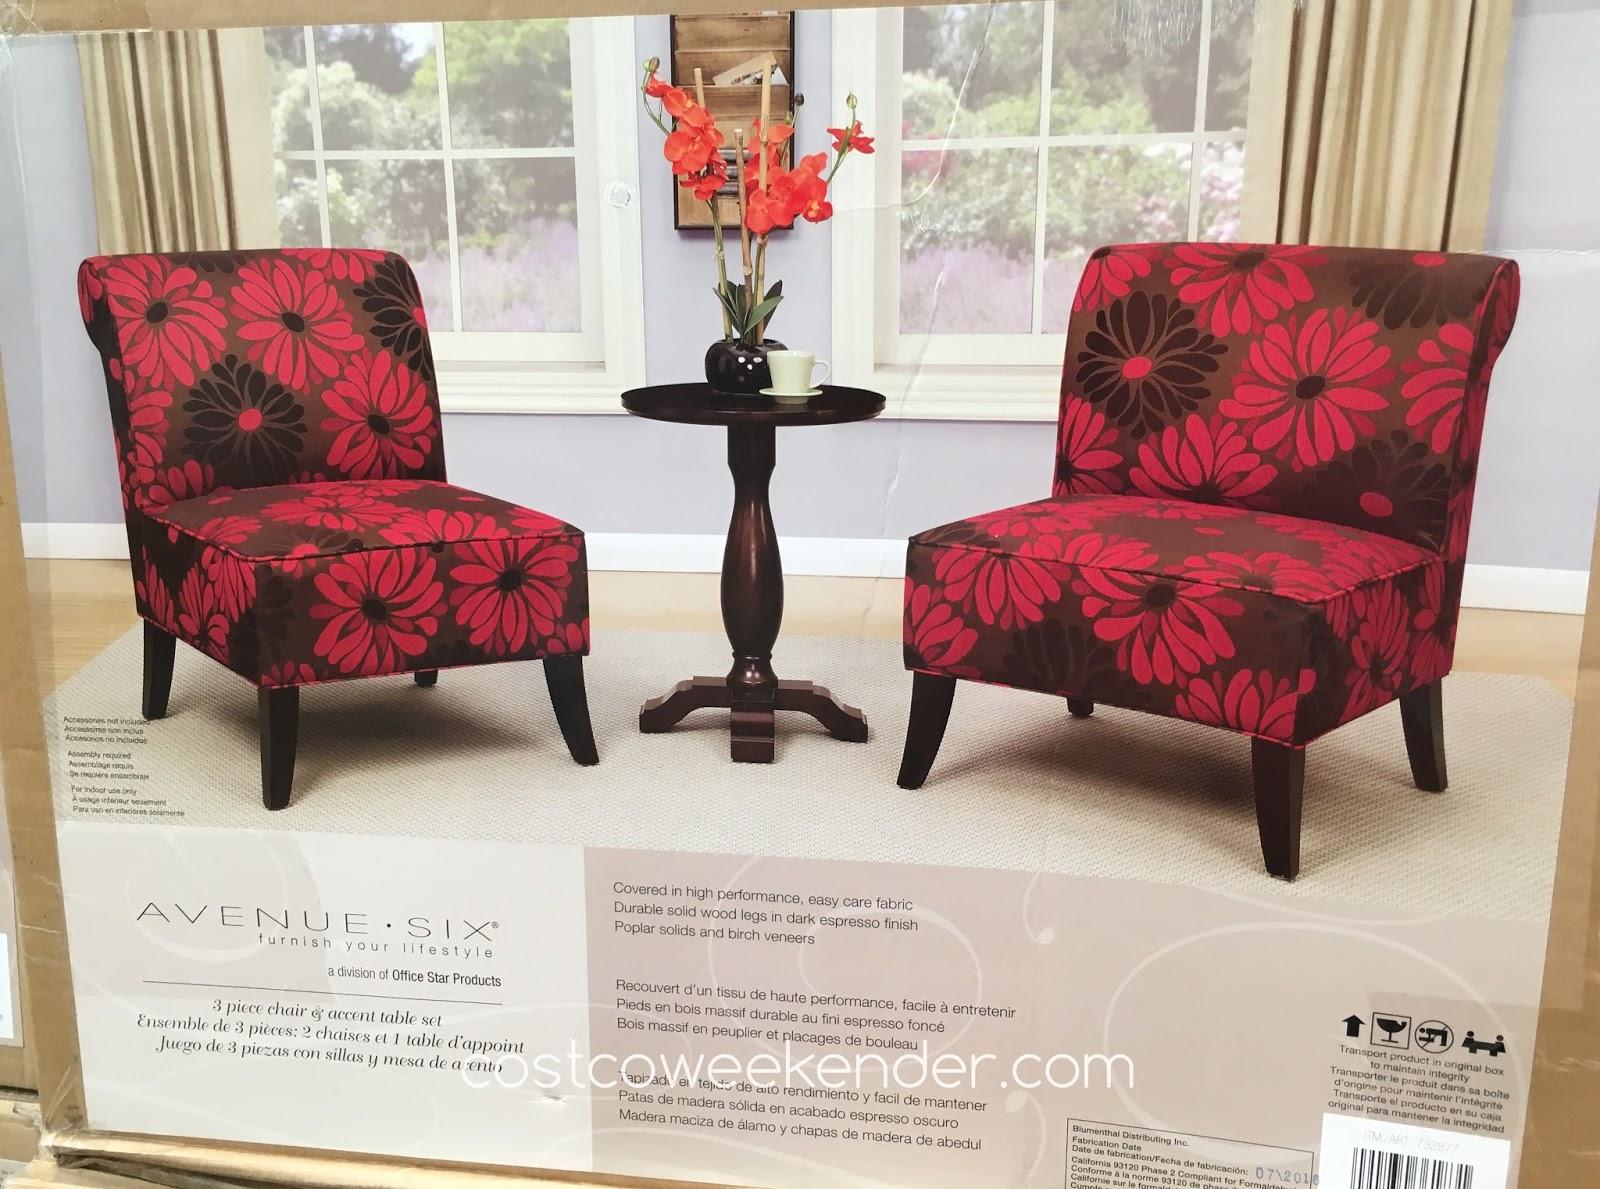 Ave Six Chair Chiavari Chairs Wedding Ann Arbor Mi Avenue 3 Piece And Accent Table Set Costco